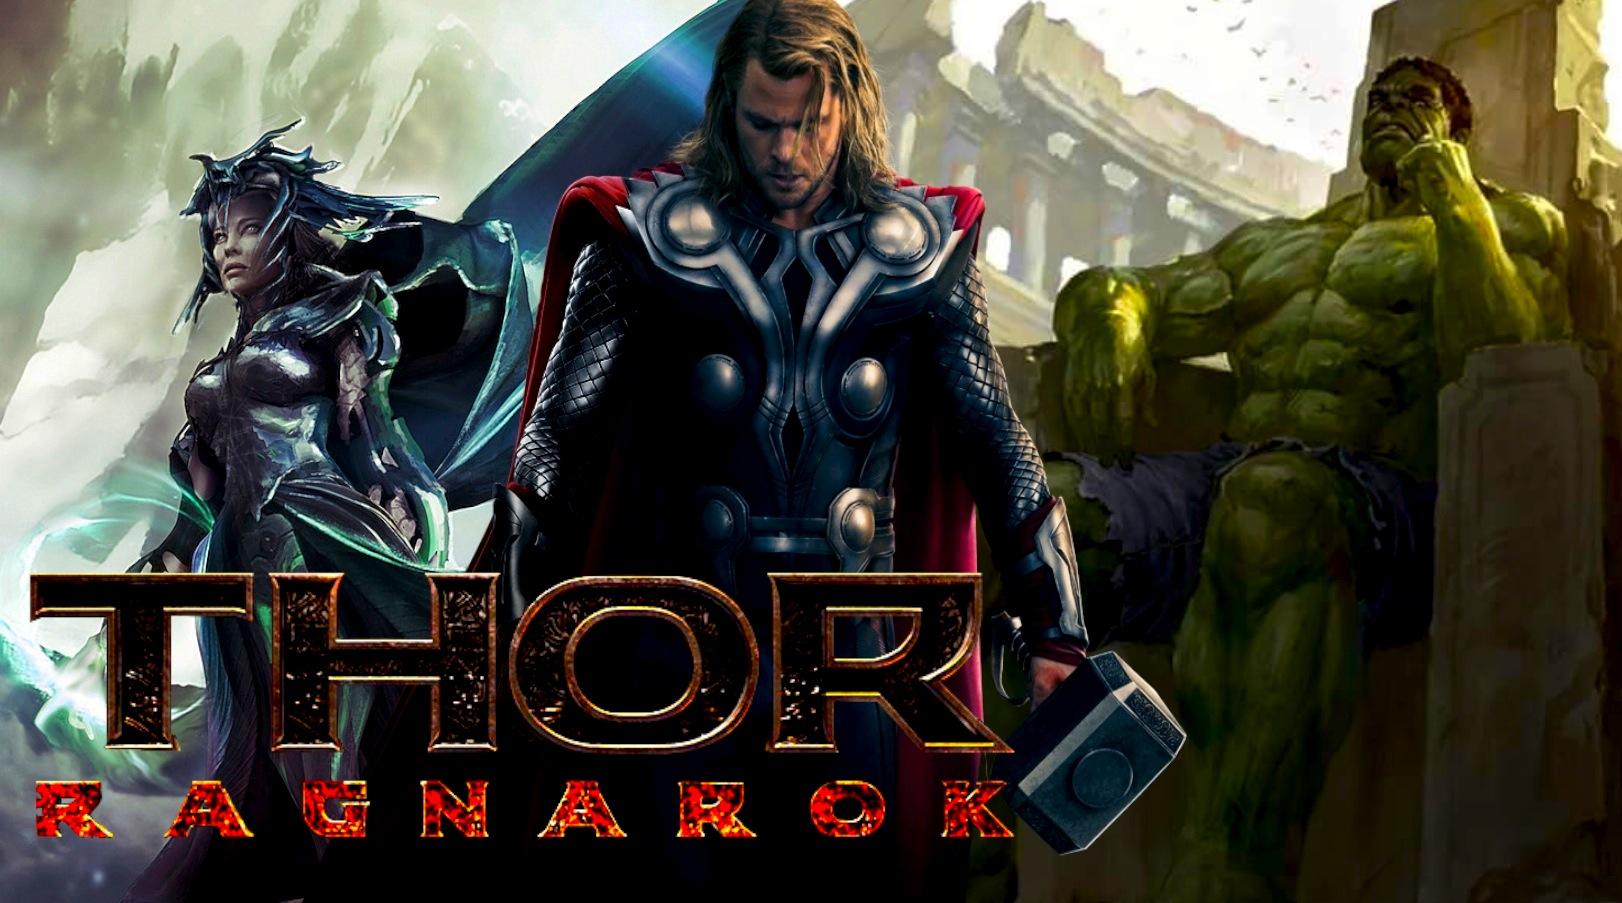 Thor Vs Hulk Ragnarok Wallpaper High Quality Thor Ragnarok